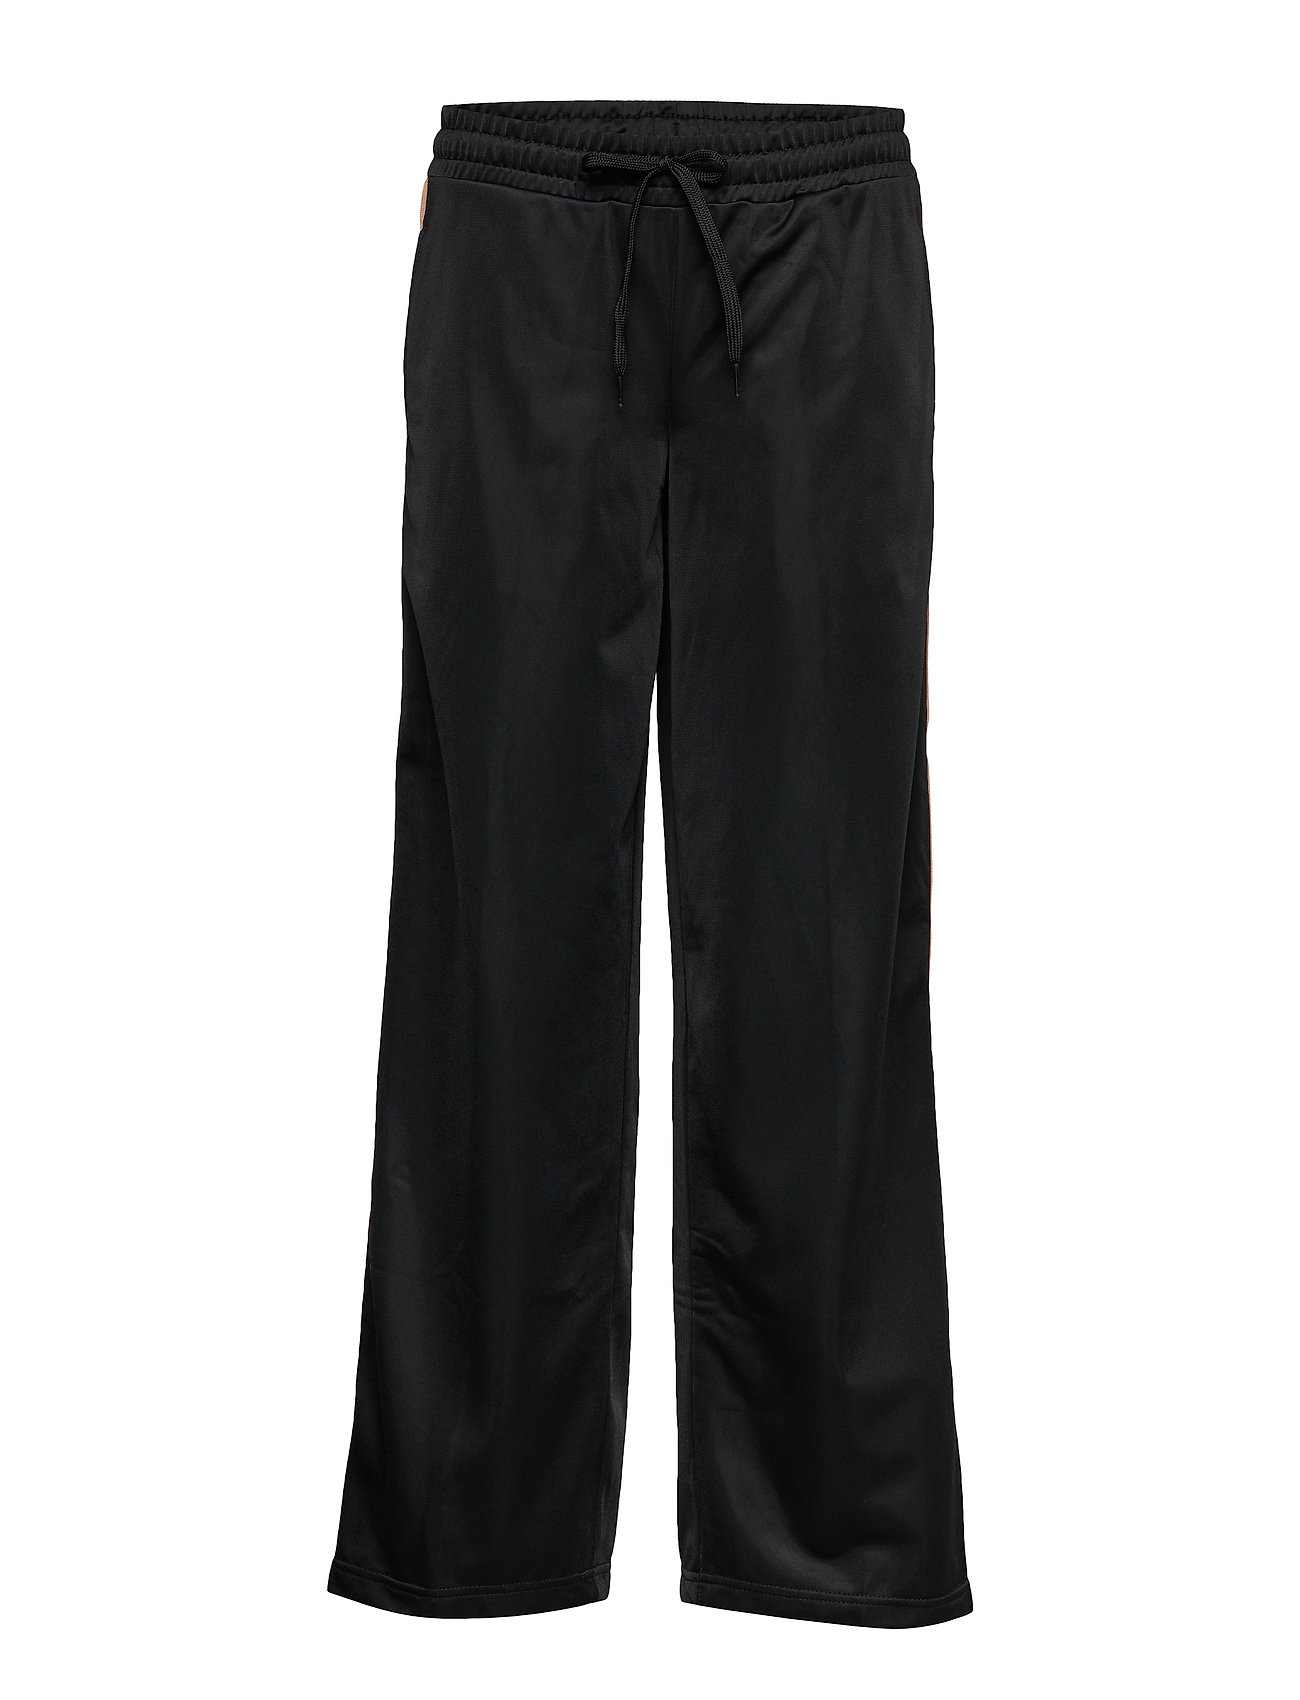 Cali Native Track Pant Sport Pants Musta VANS